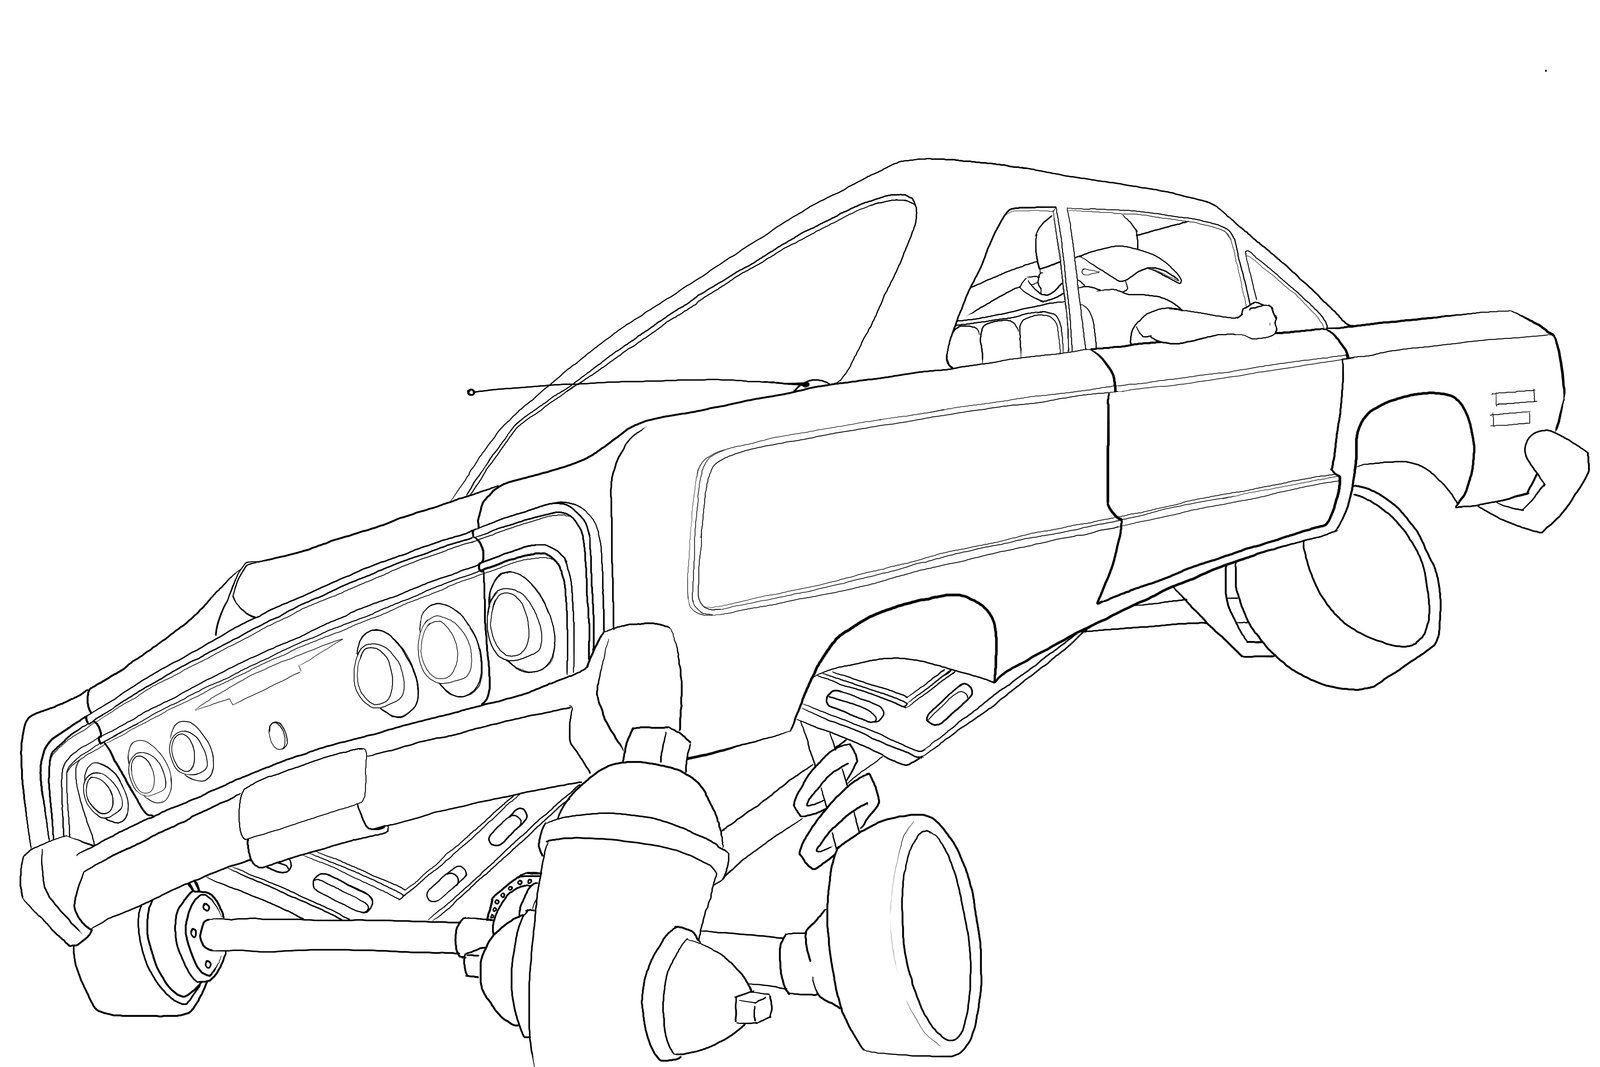 1600x1067 64 Impala By Jjhaessig